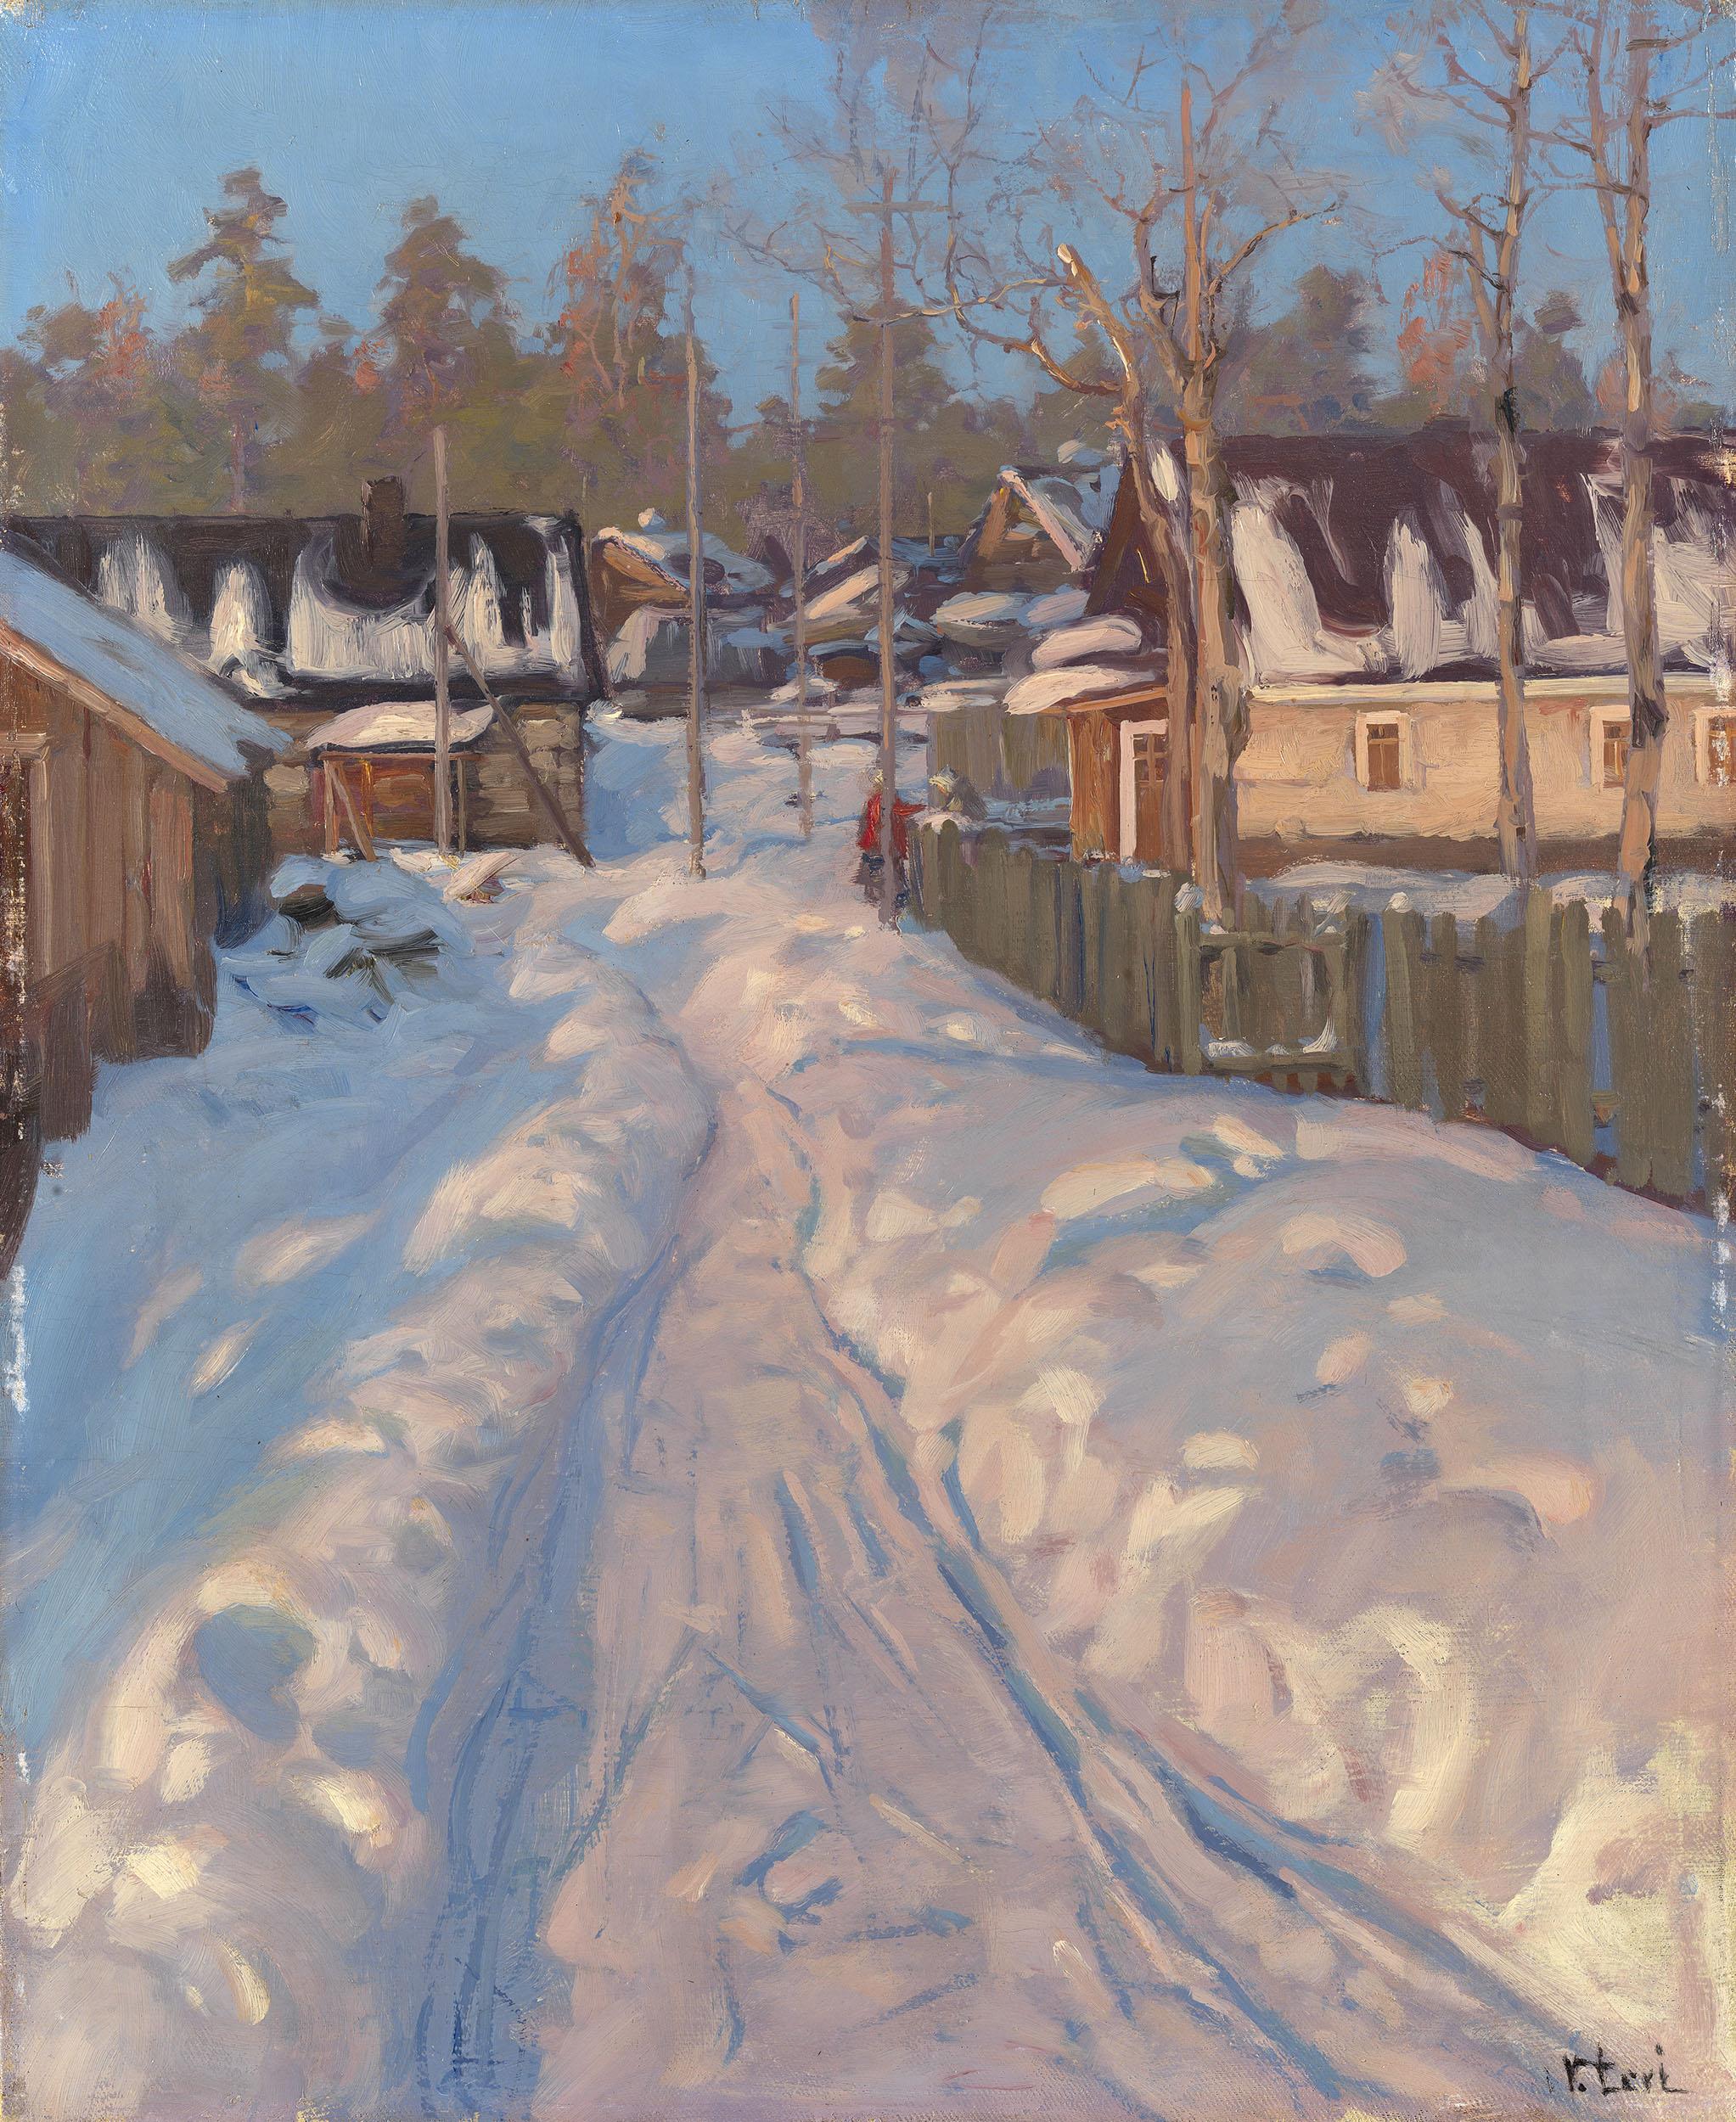 LEVI, VASILY Russian Village in Winter